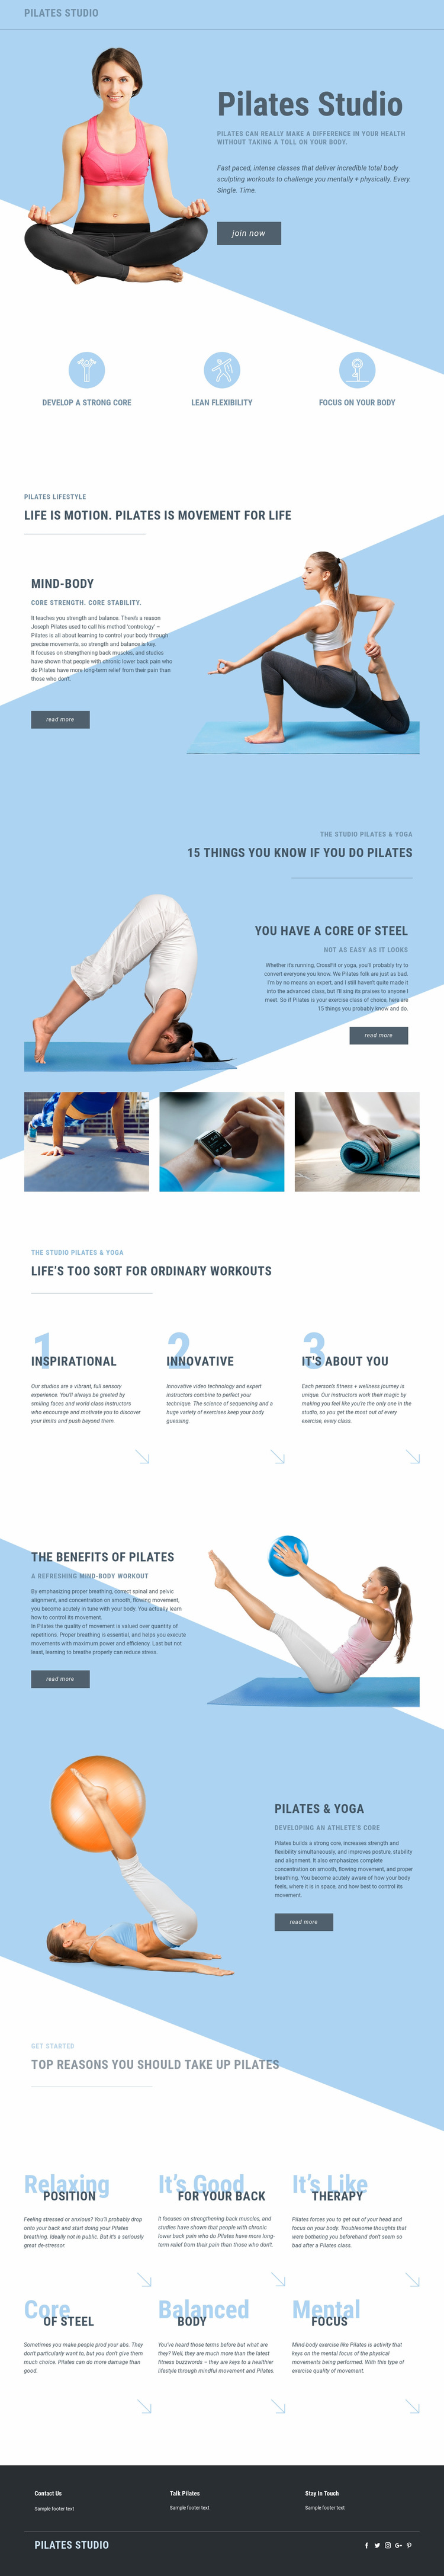 Pilates studio and sports Web Page Design